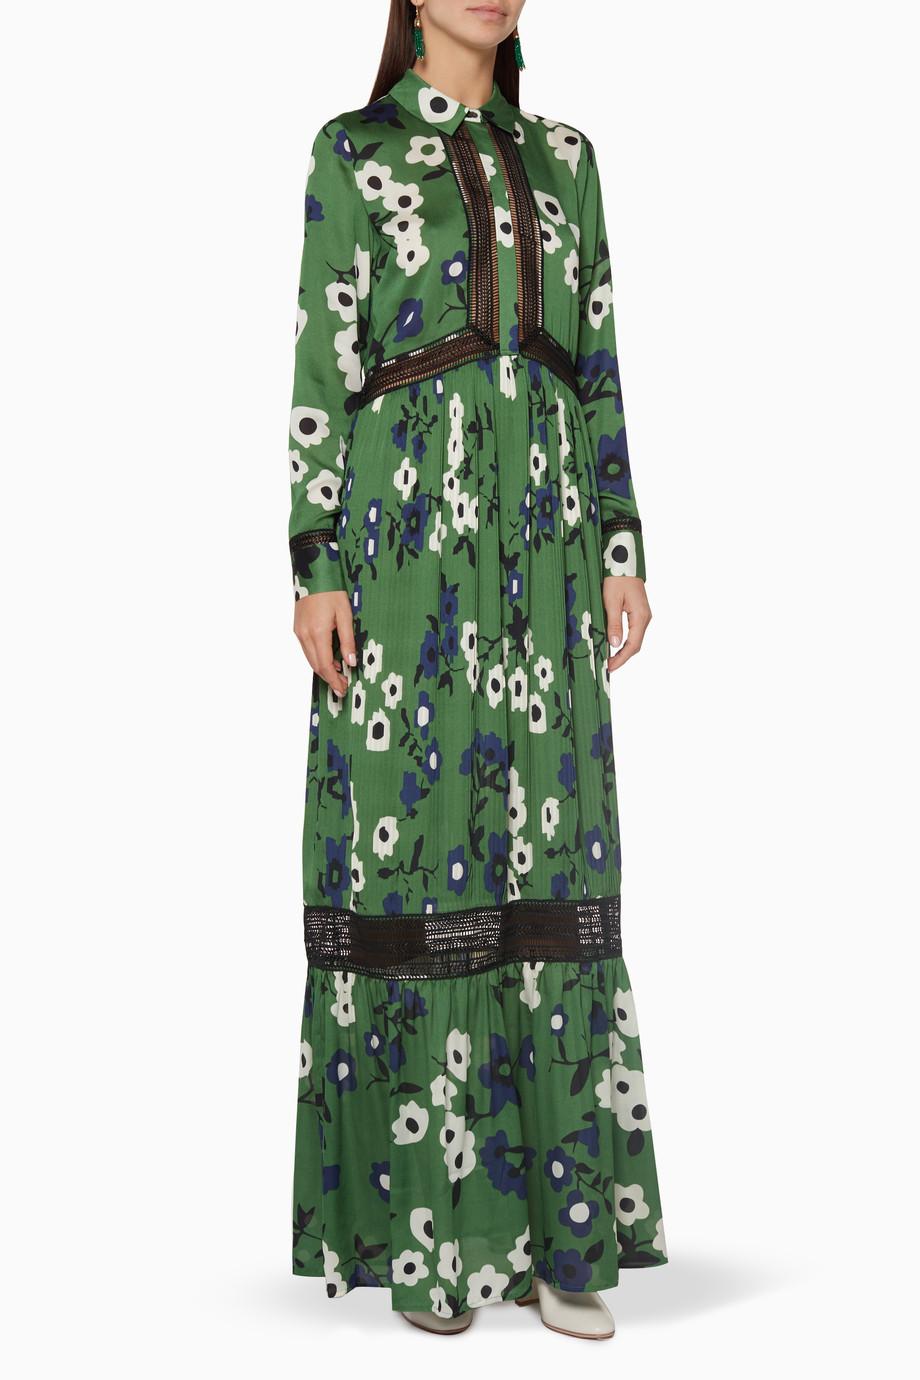 37adc941c3c5 Shop Self-Portrait Green Green Ebony Printed Shirtdress for Women ...